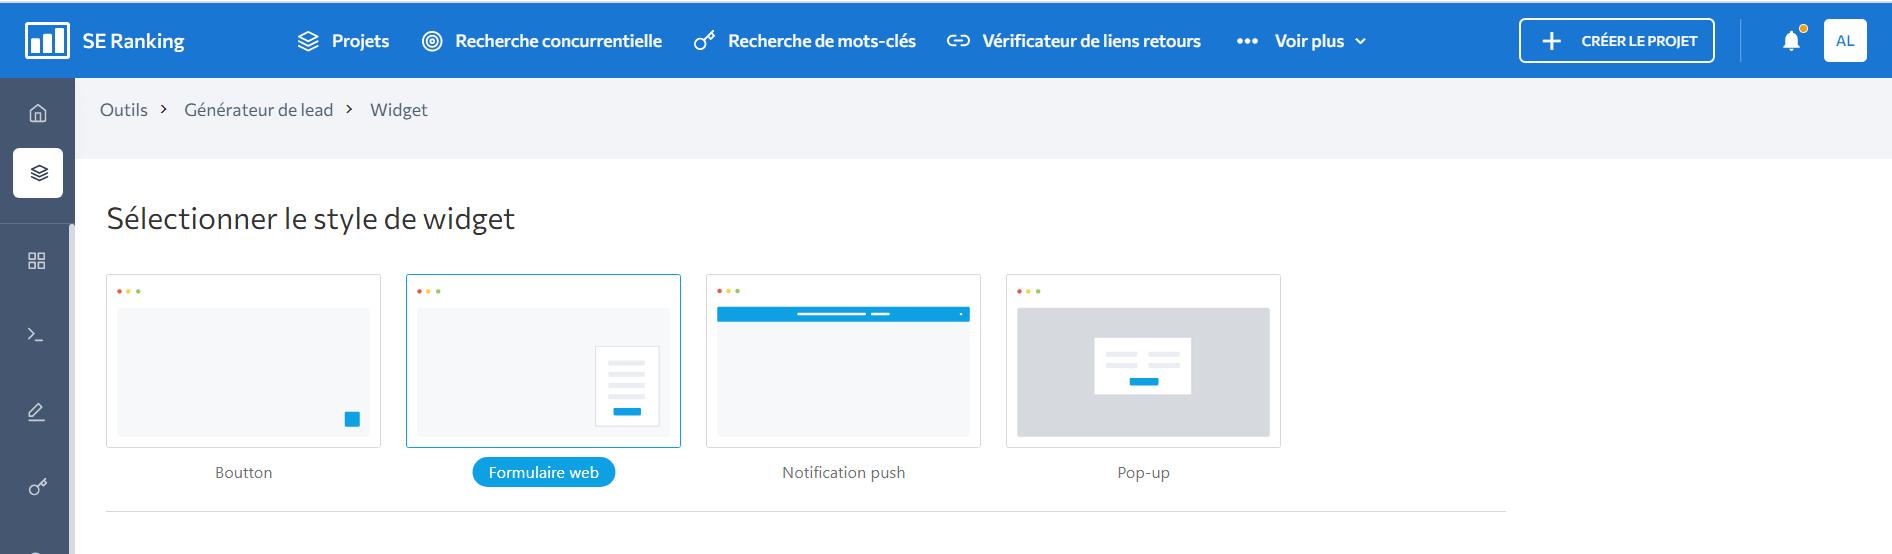 webform-widget-fr